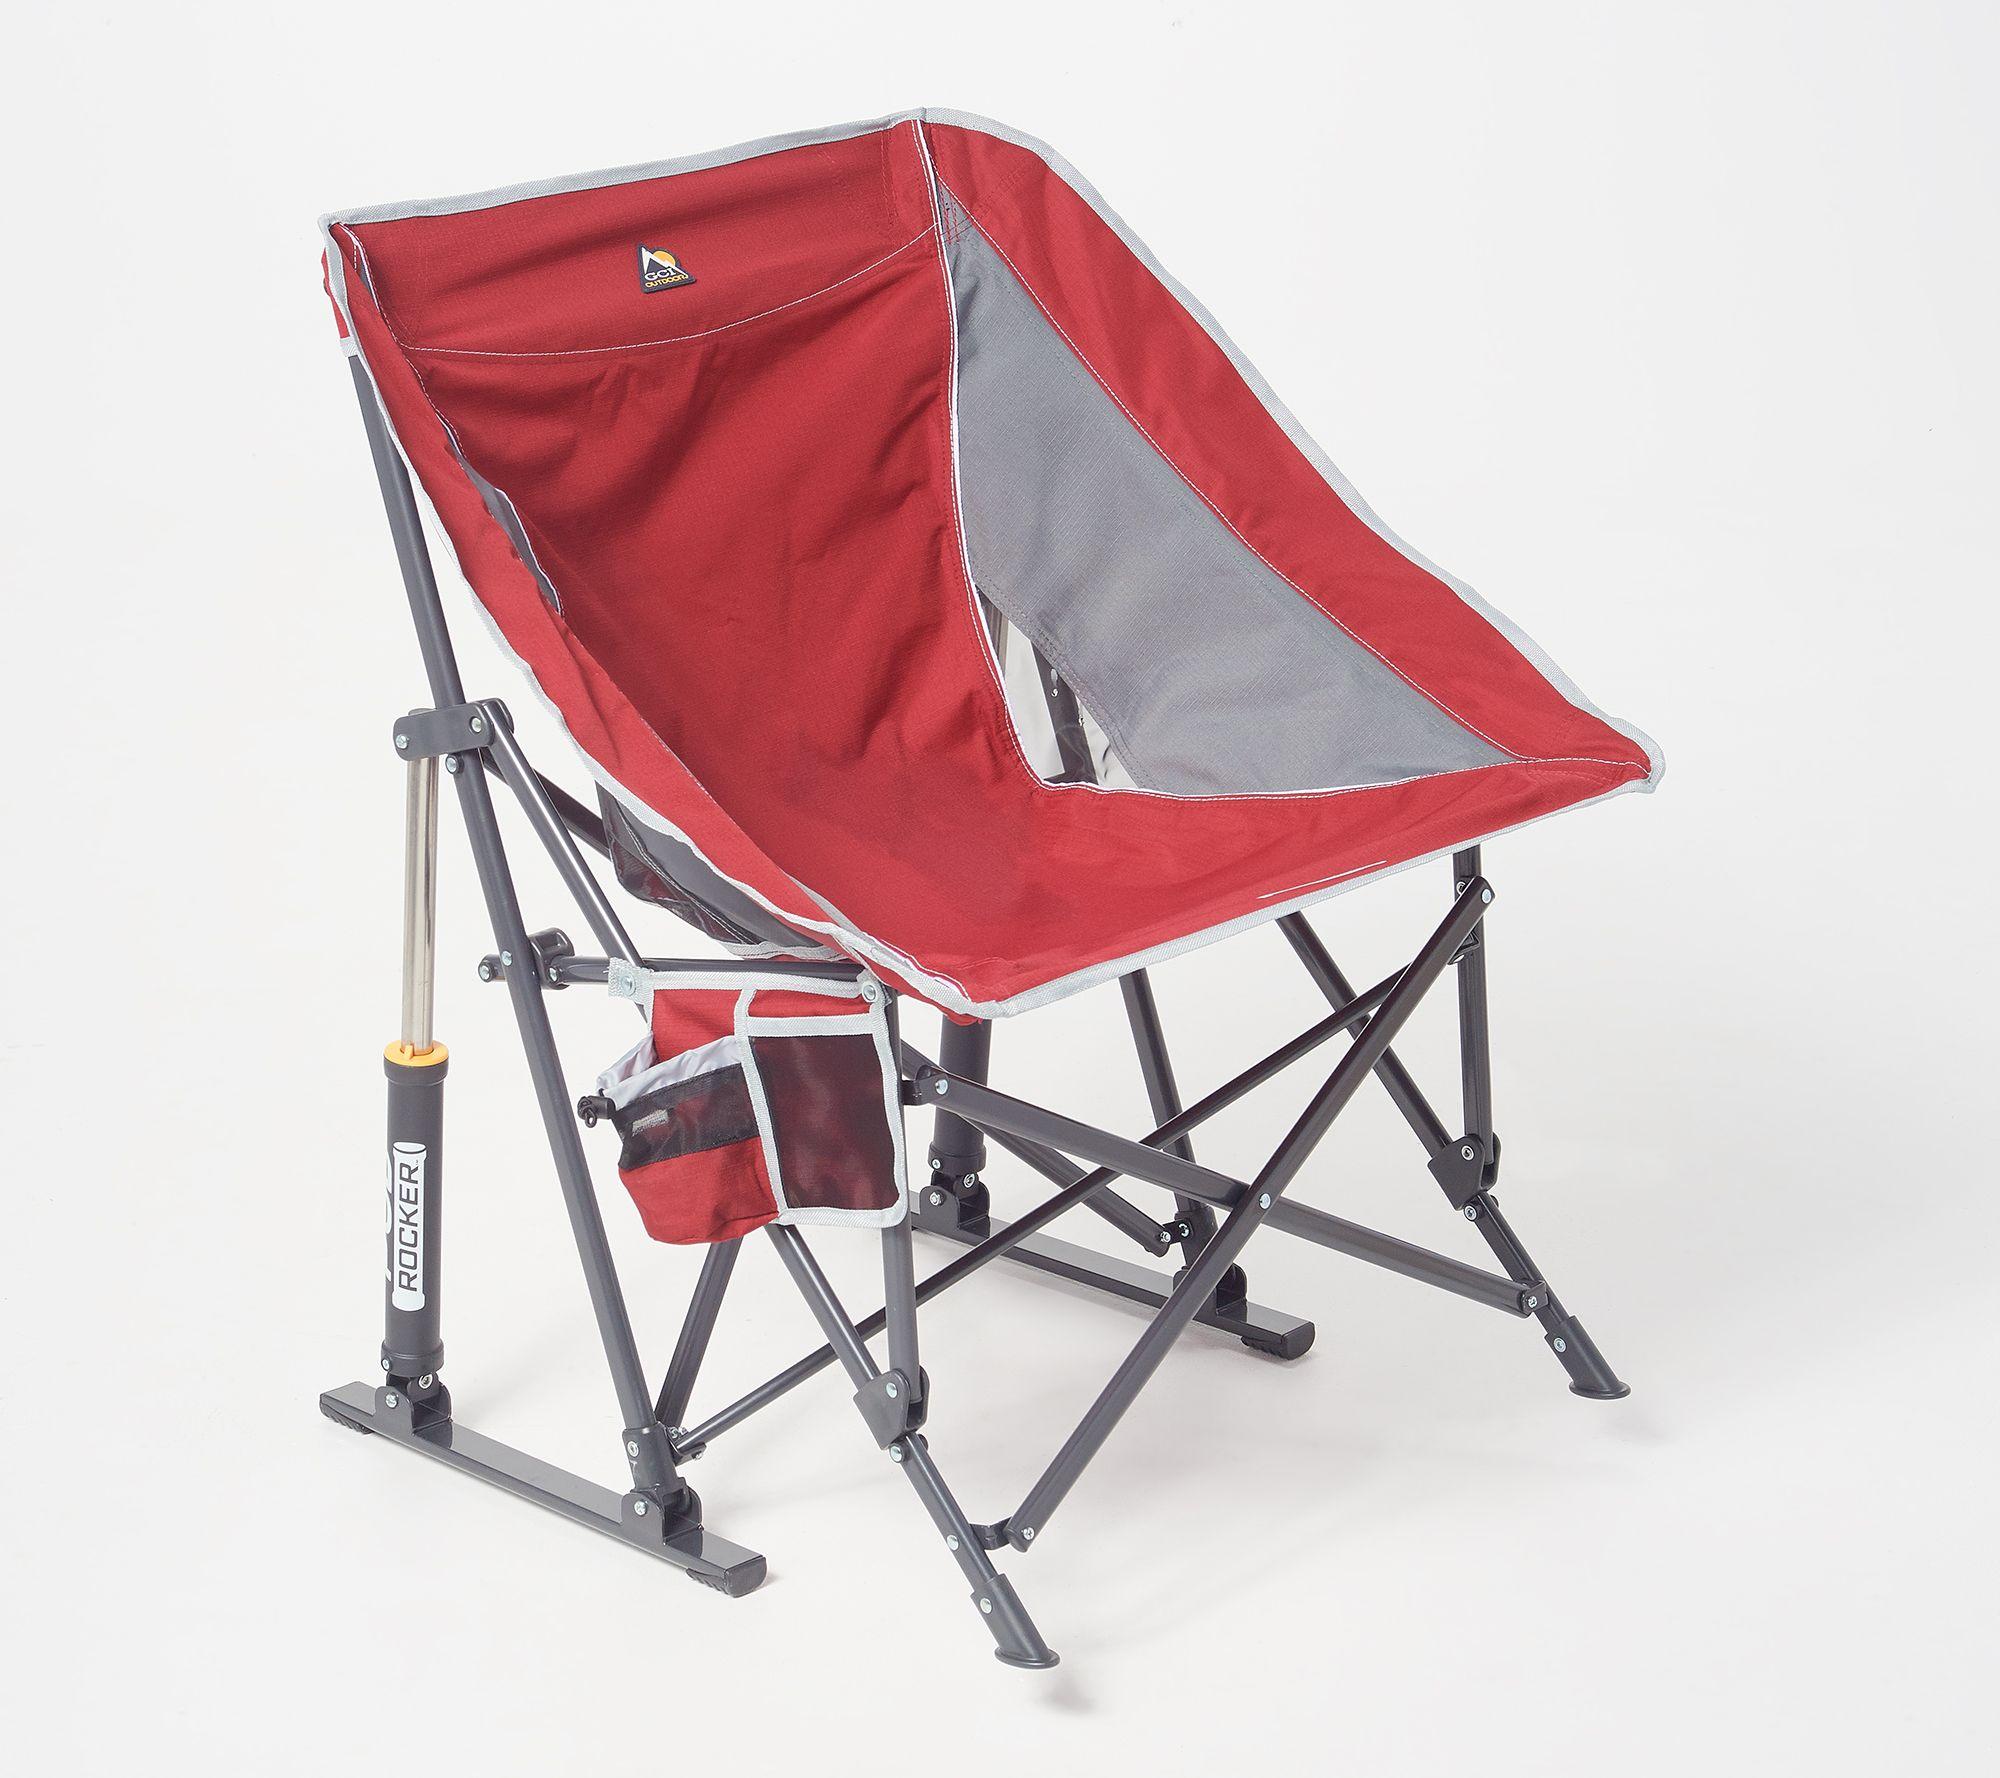 Pleasant Gci Outdoor Pod Pro Rocker Chair With Carry Bag Qvc Com Uwap Interior Chair Design Uwaporg